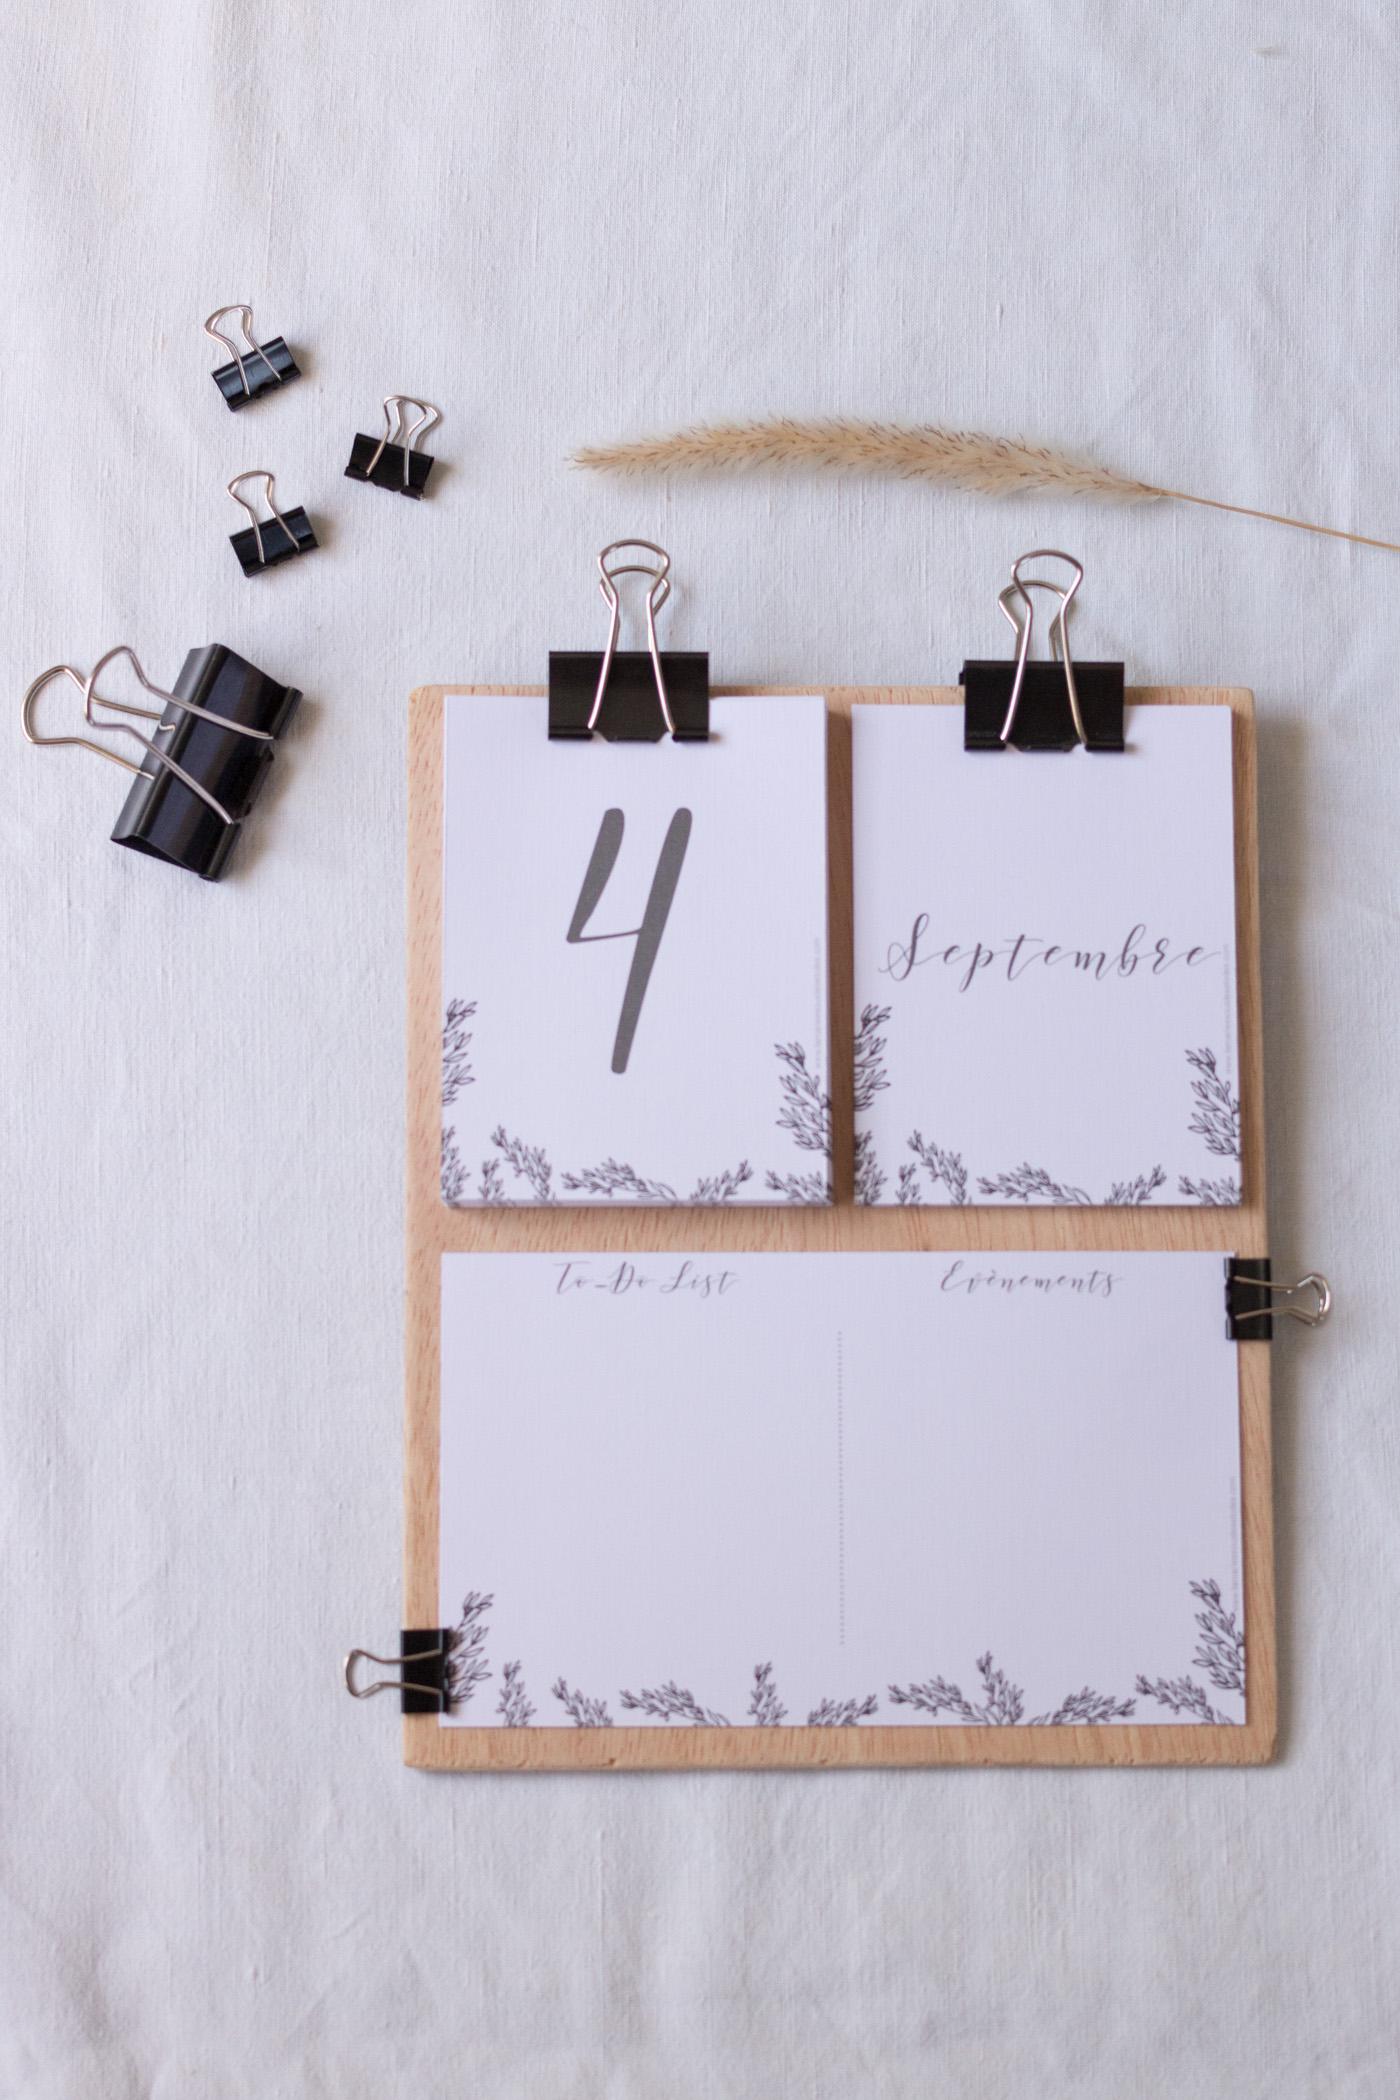 DiY Printable Calendrier DiY esprit kinfolk a imprimermade by La Mariee Sous Les Etoiles x Make My Wed-23